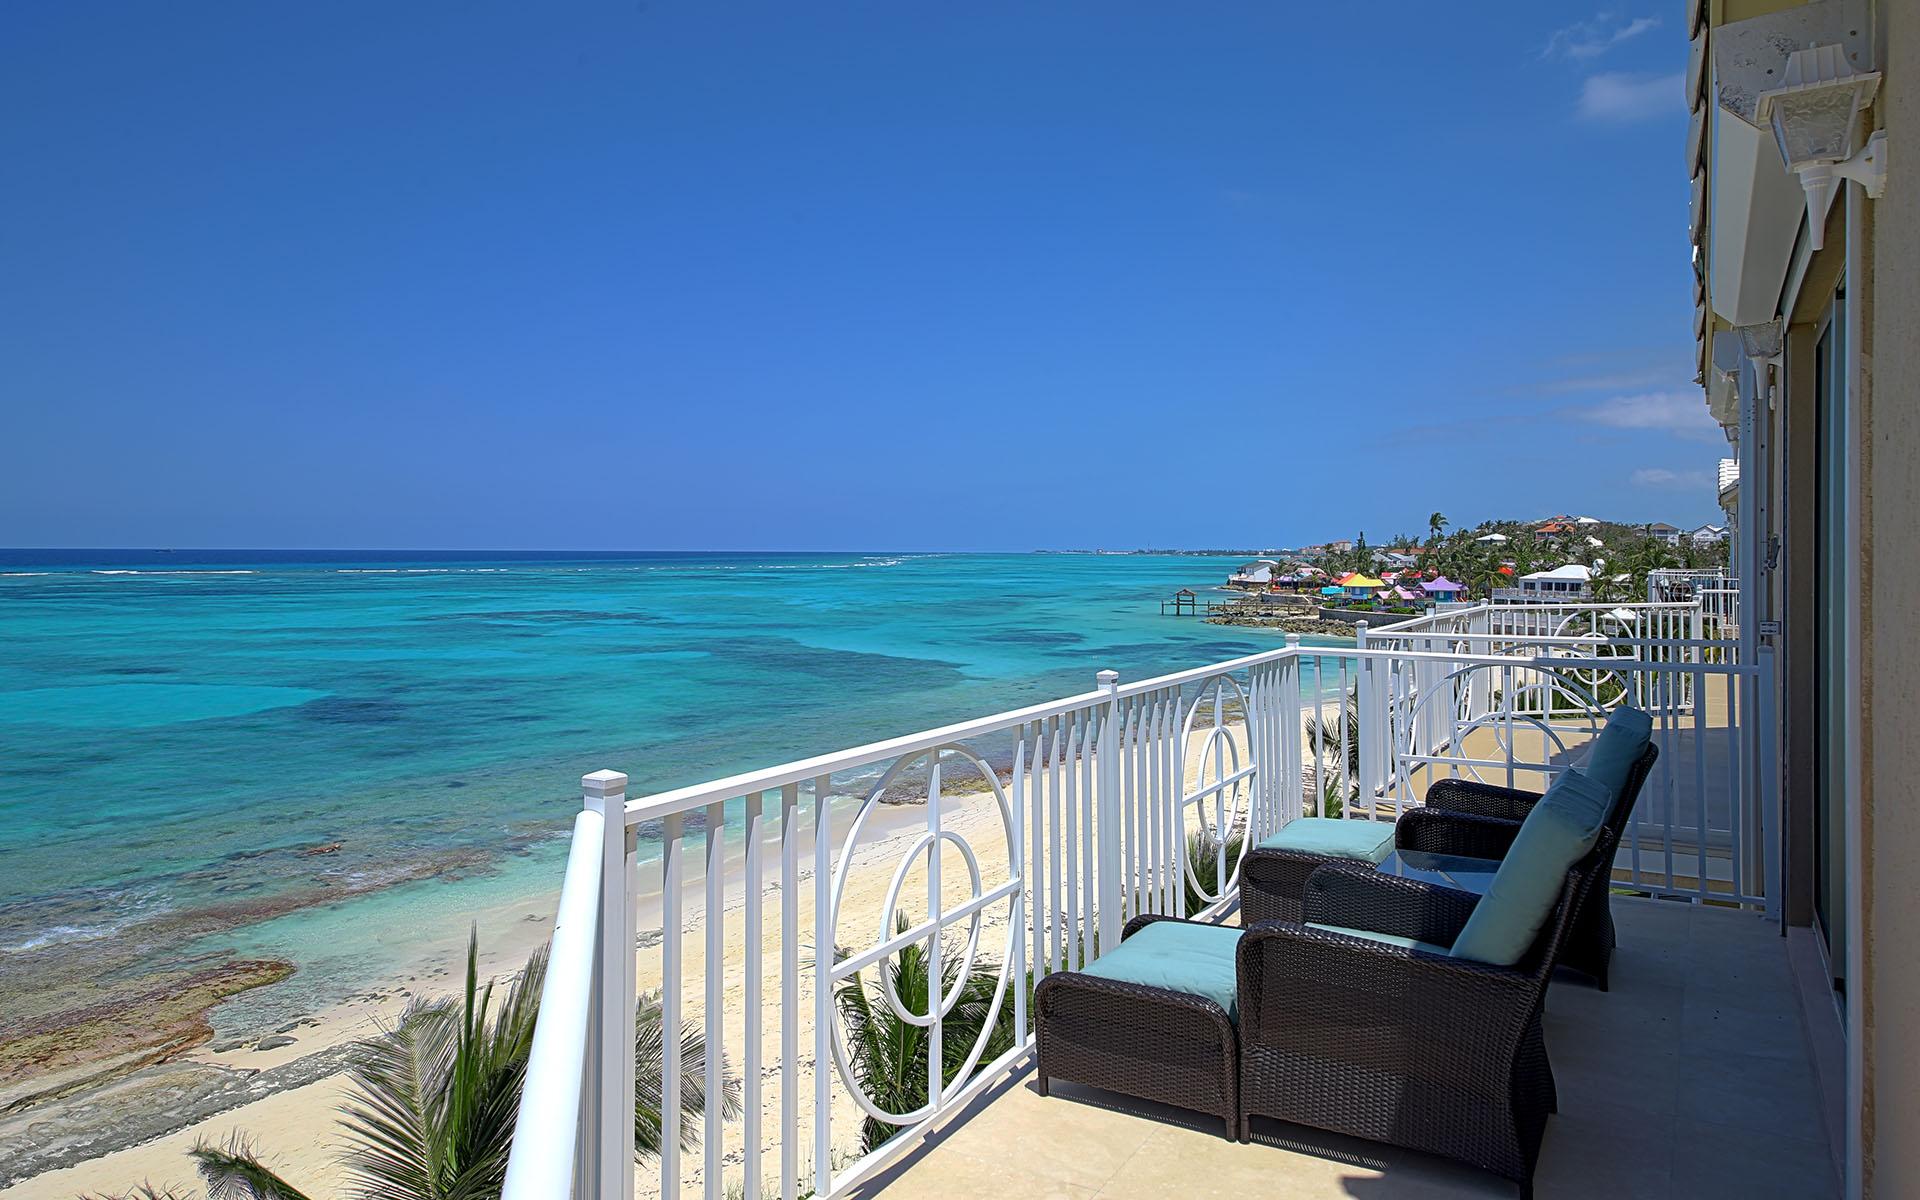 Co-op / Condo for Sale at Beautiful beachfront penthouse in Love Beach Walk - MLS 30000 Love Beach, Nassau And Paradise Island, Bahamas